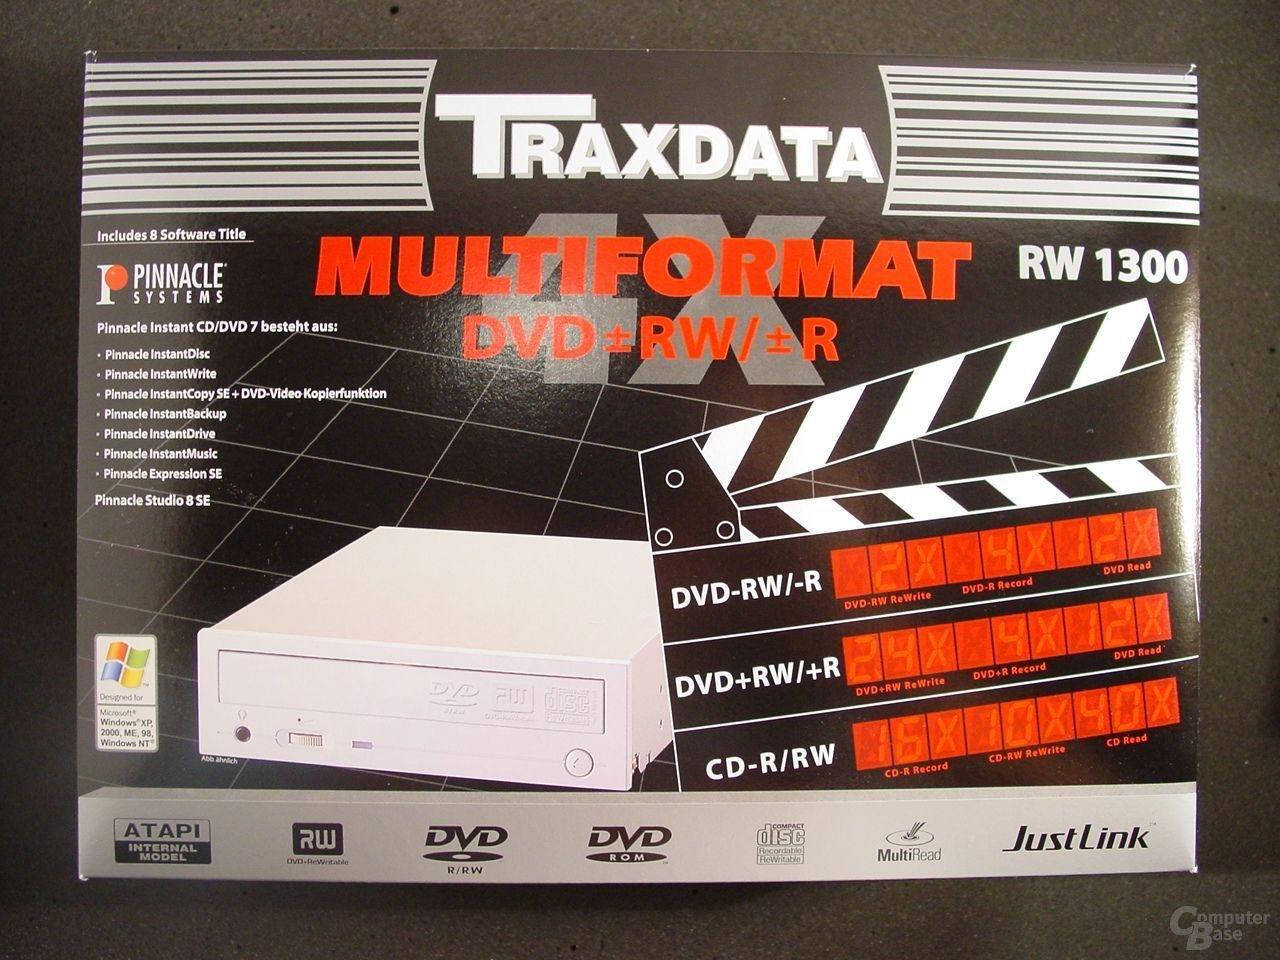 Verpackung Traxdata RW 1300